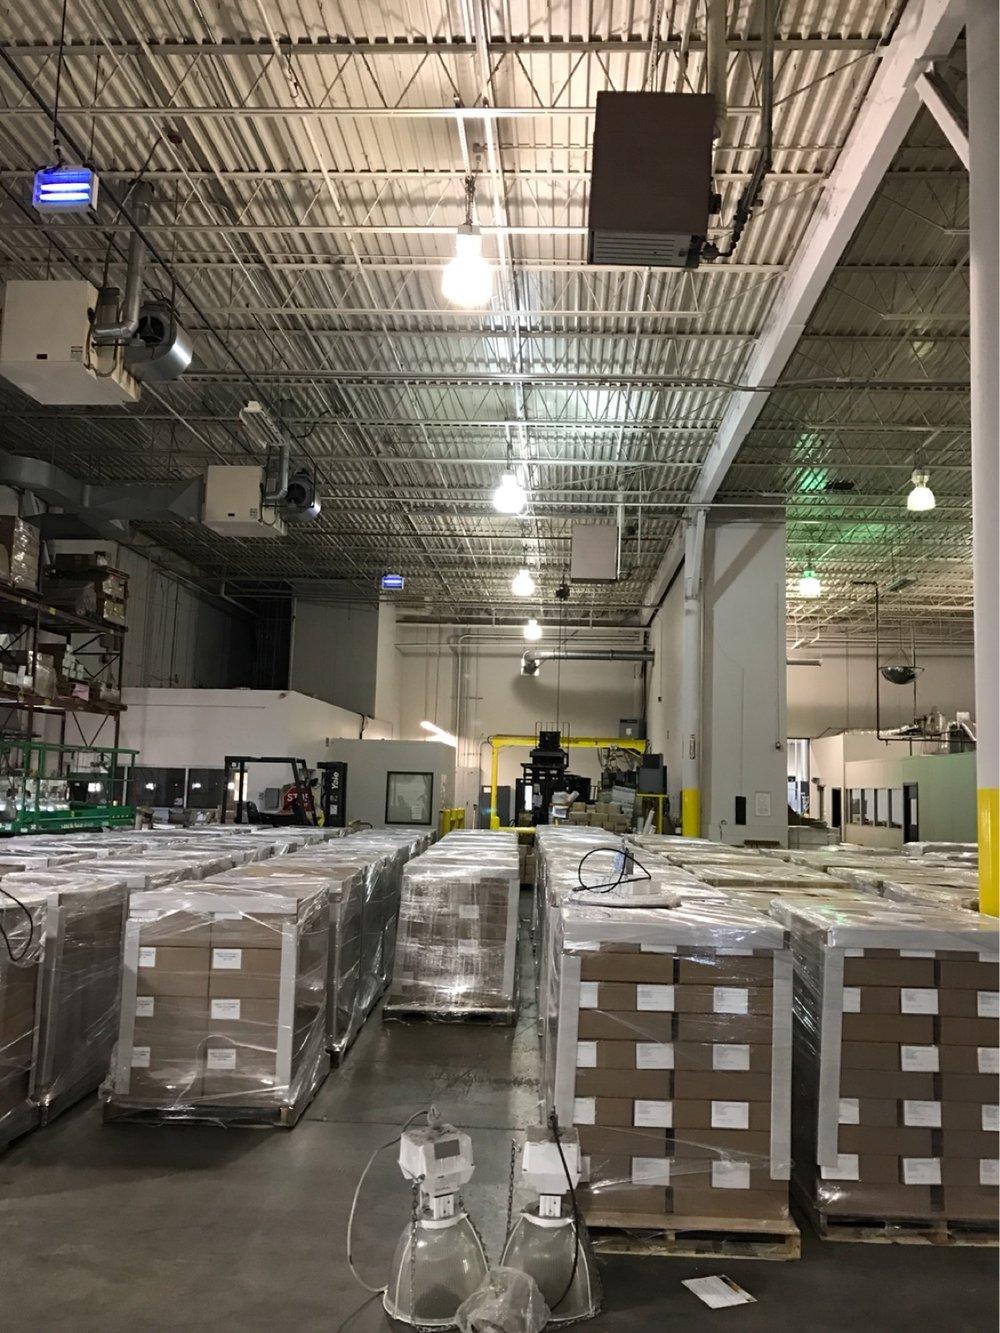 Unimac Graphics LED Lighting Retrofit - Albright Energy Solutions - Albright Electric - Mahwah NJ (5).jpeg